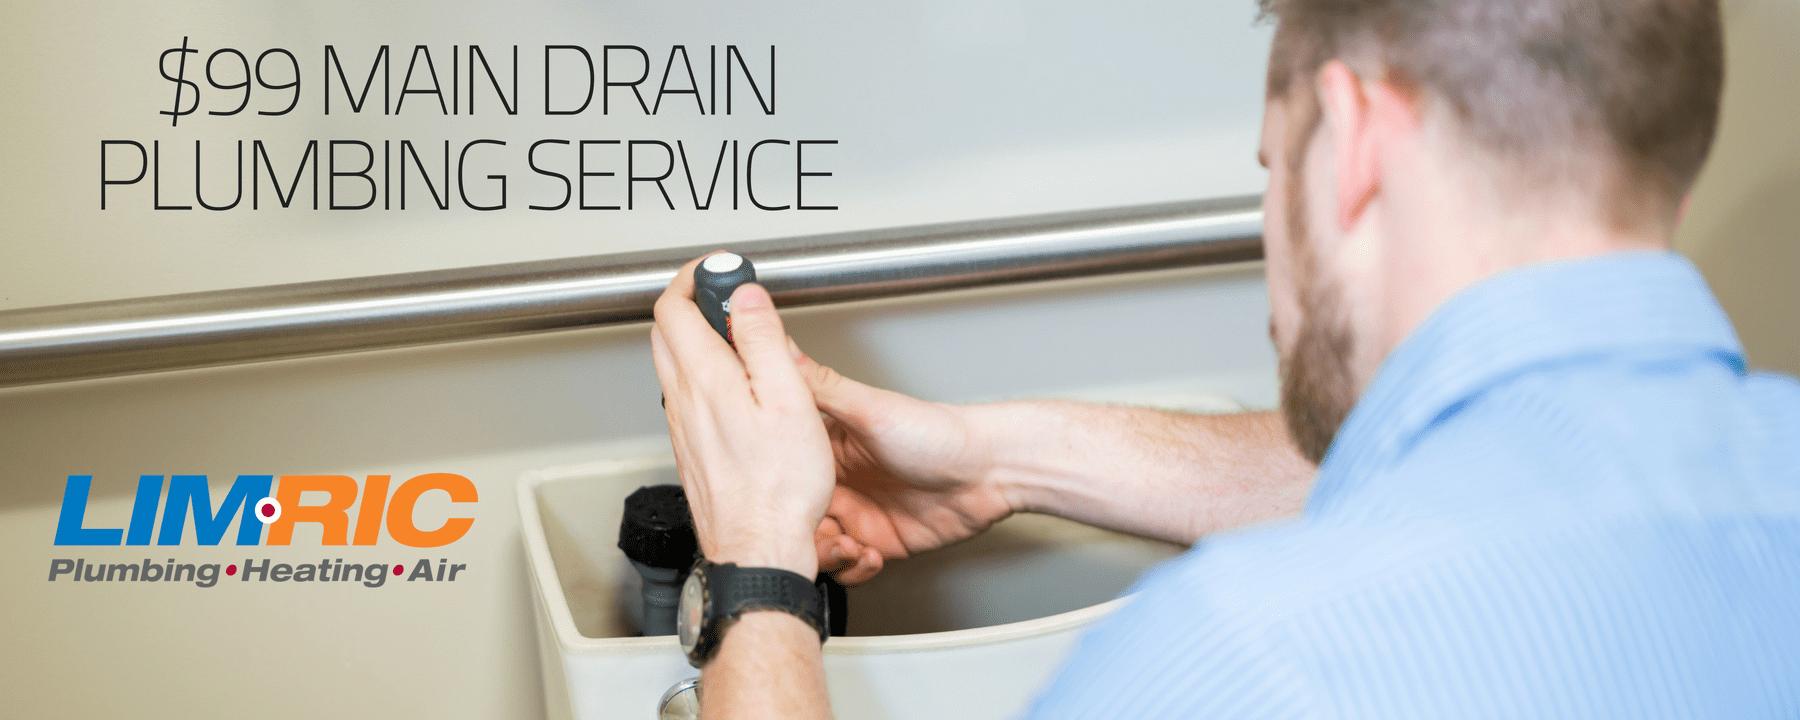 $99 Main Drain Plumbing Service